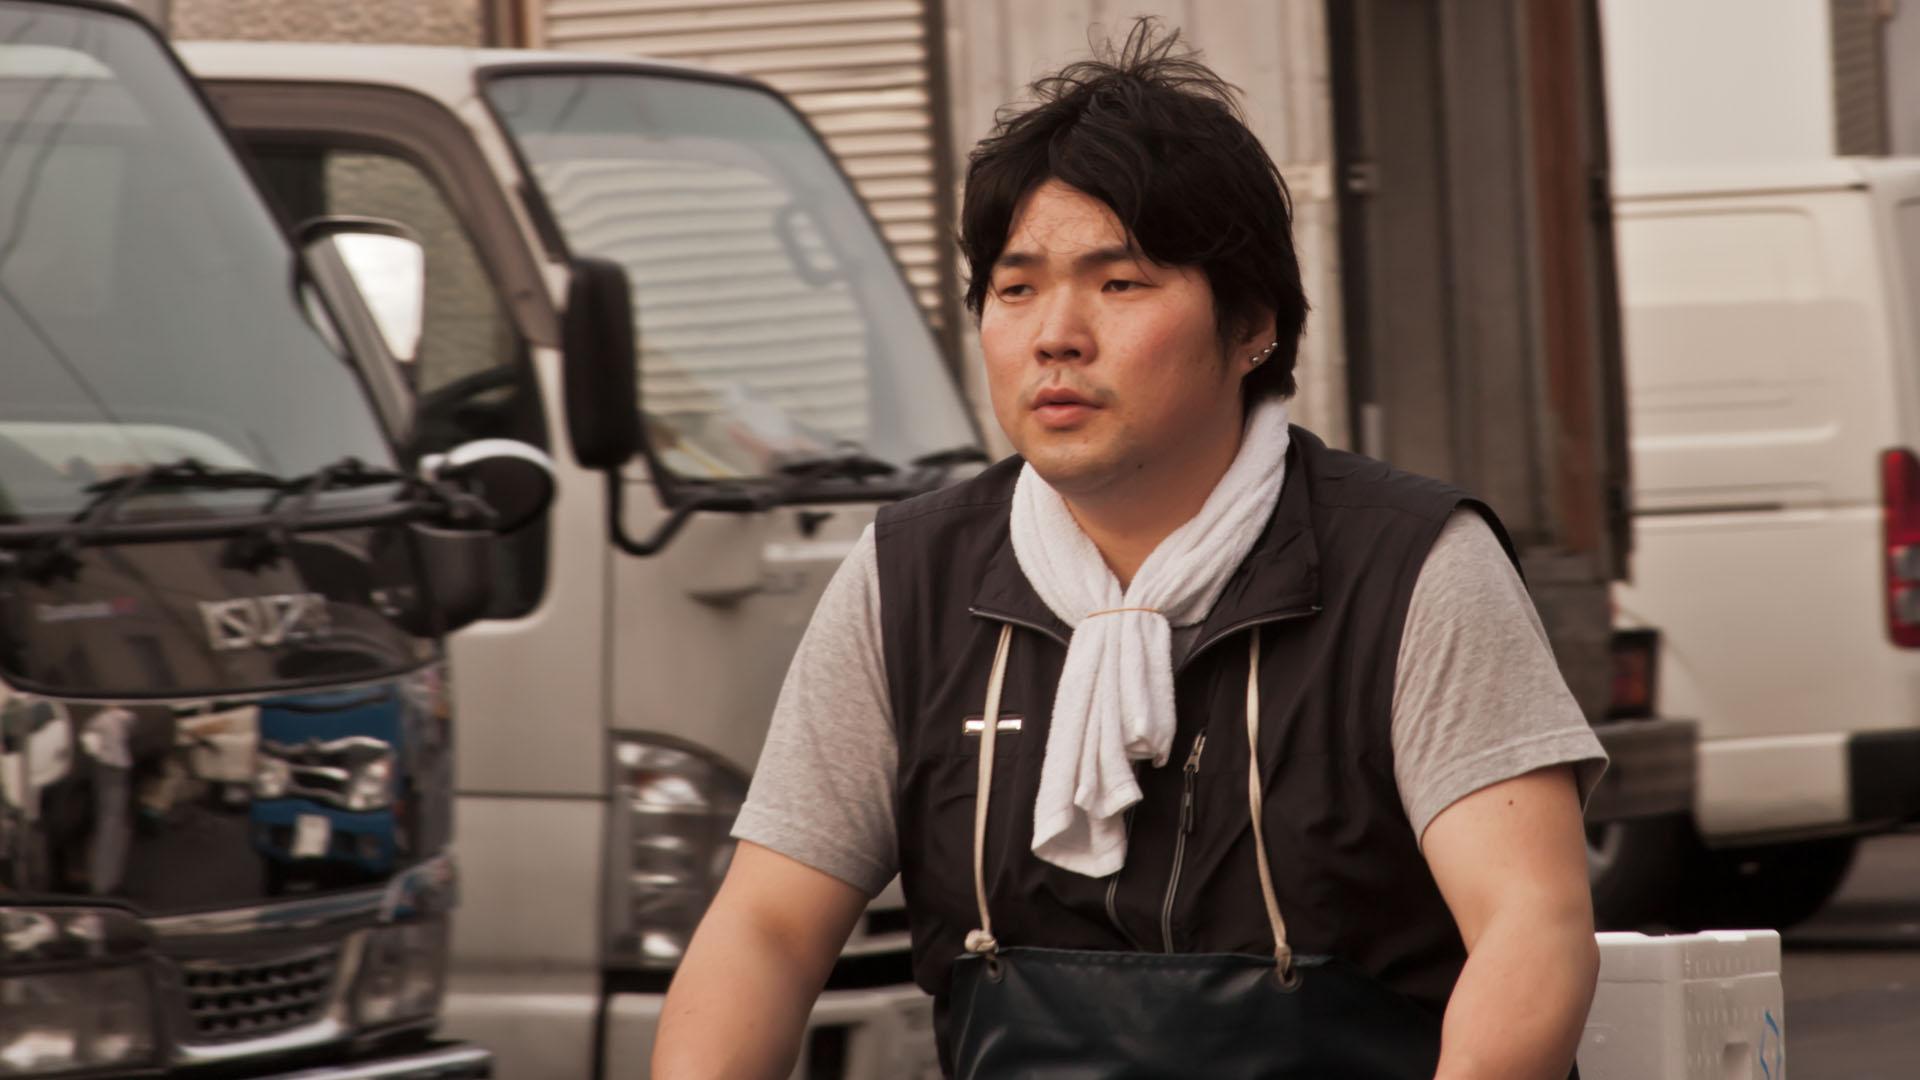 Japan_0005s_0001_17